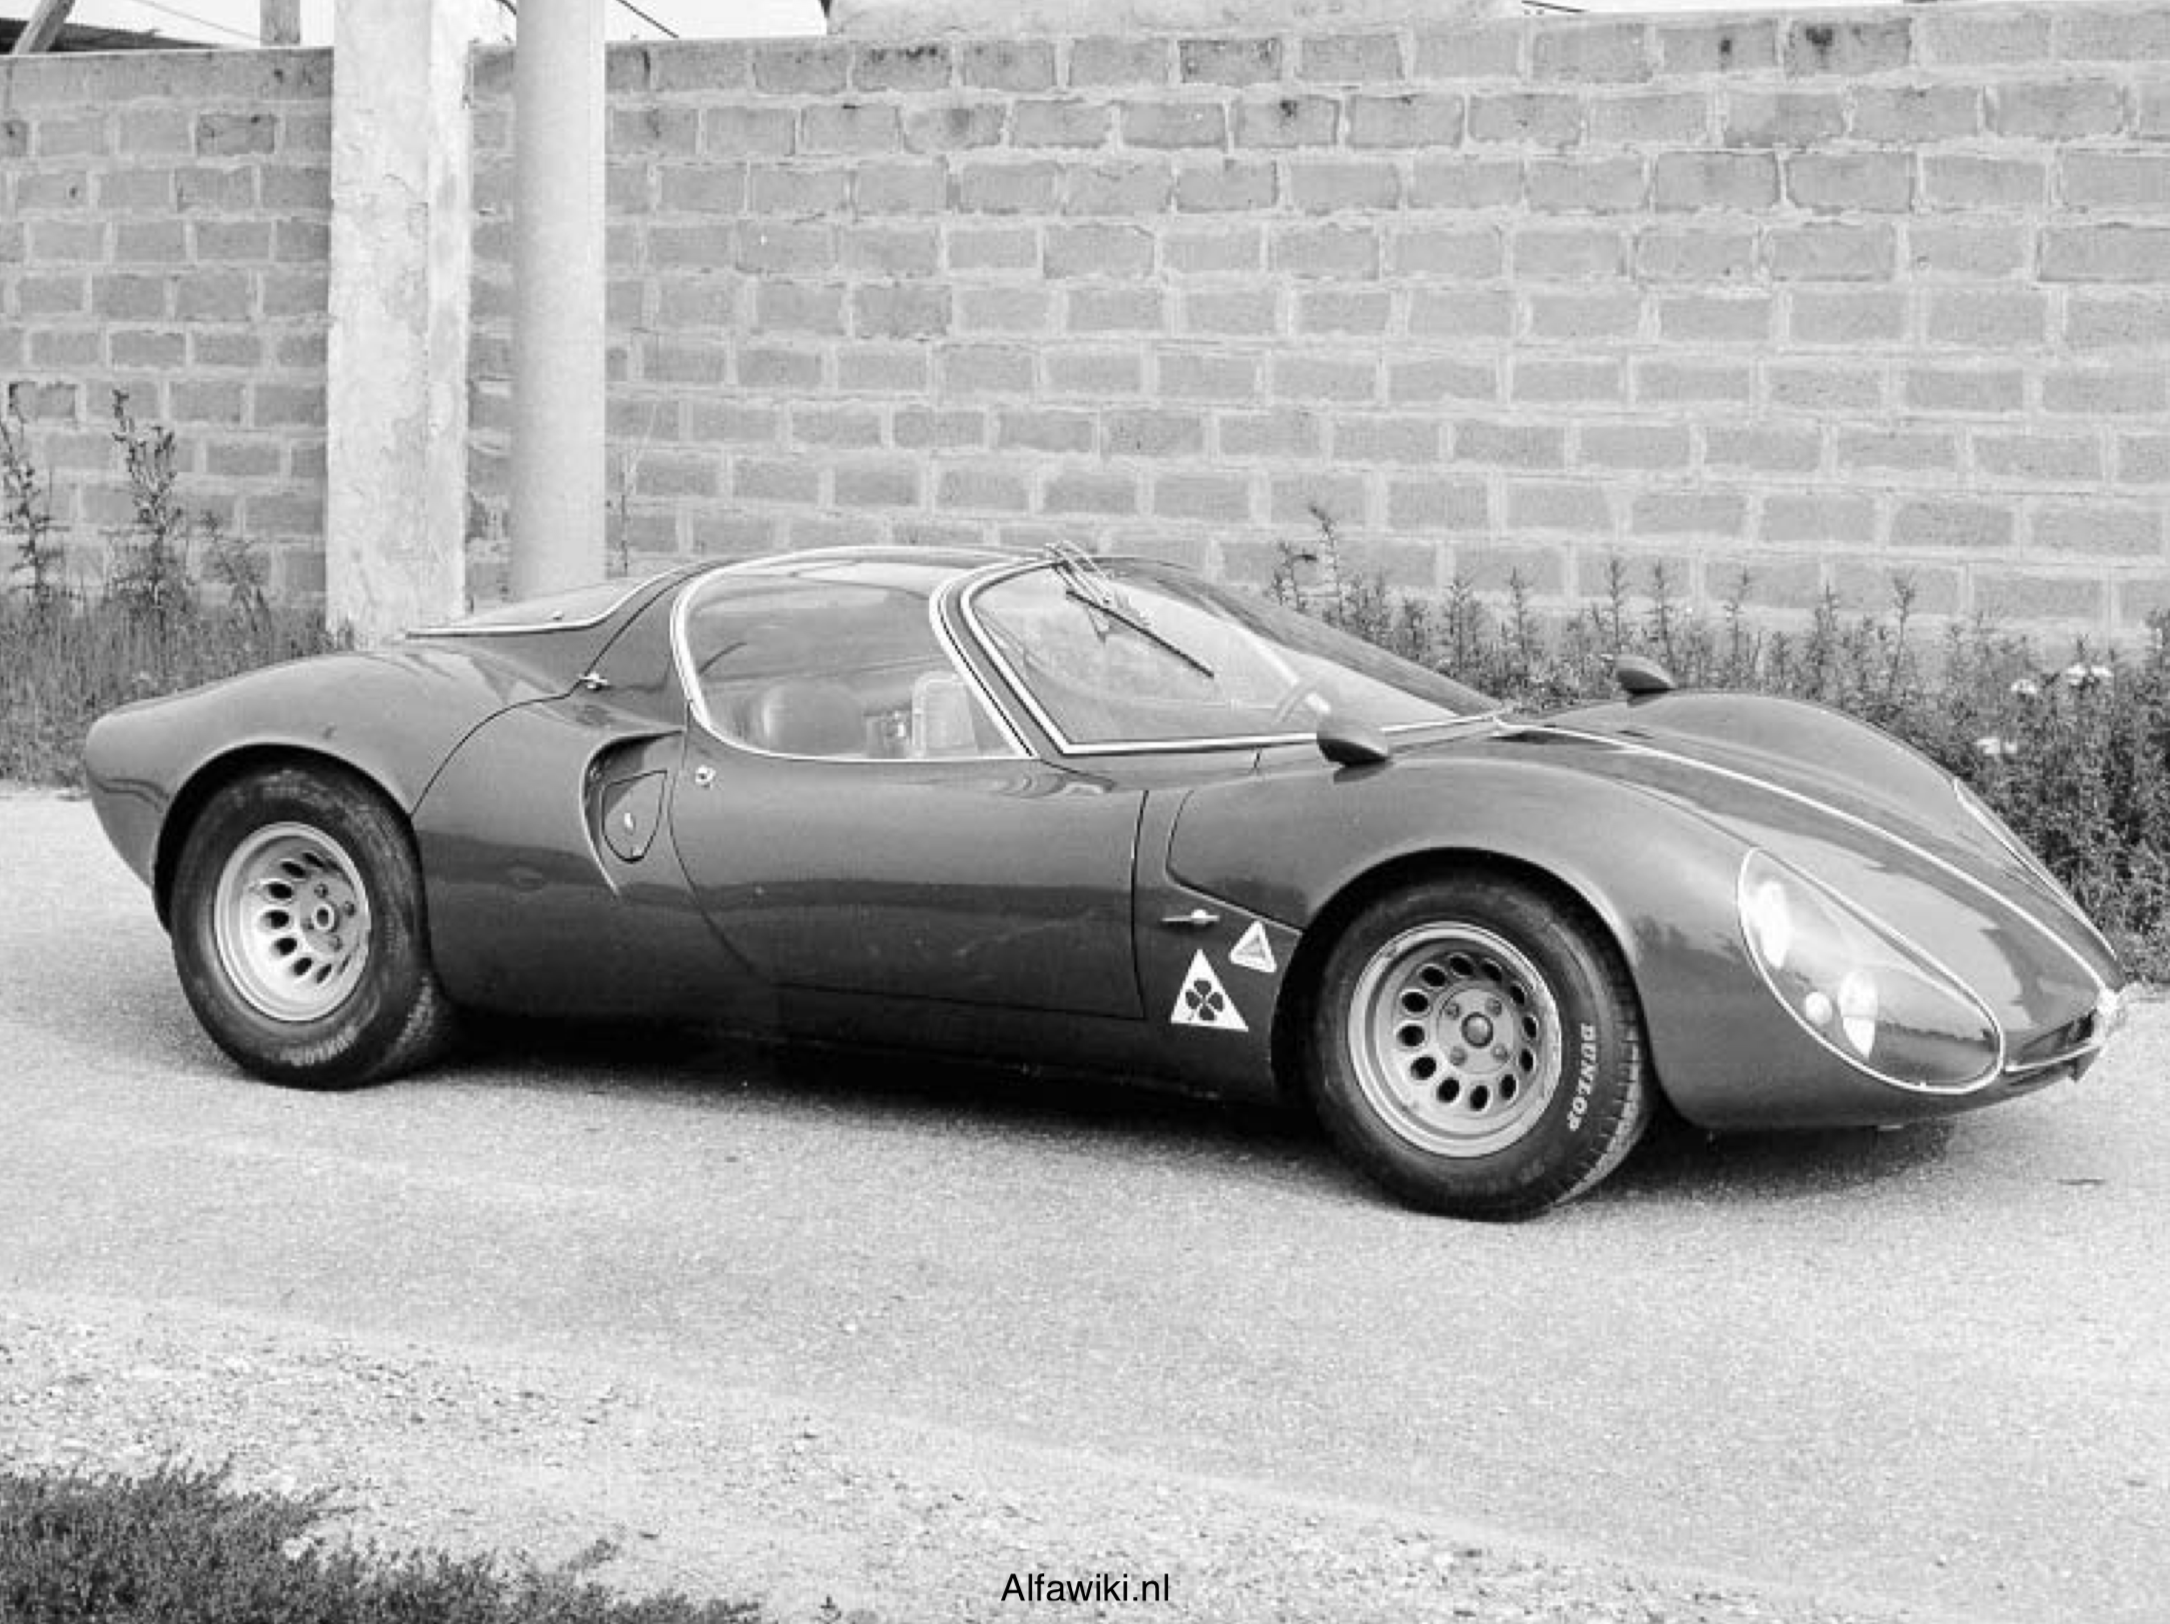 Alfa Romeo 33 Stradale press photos